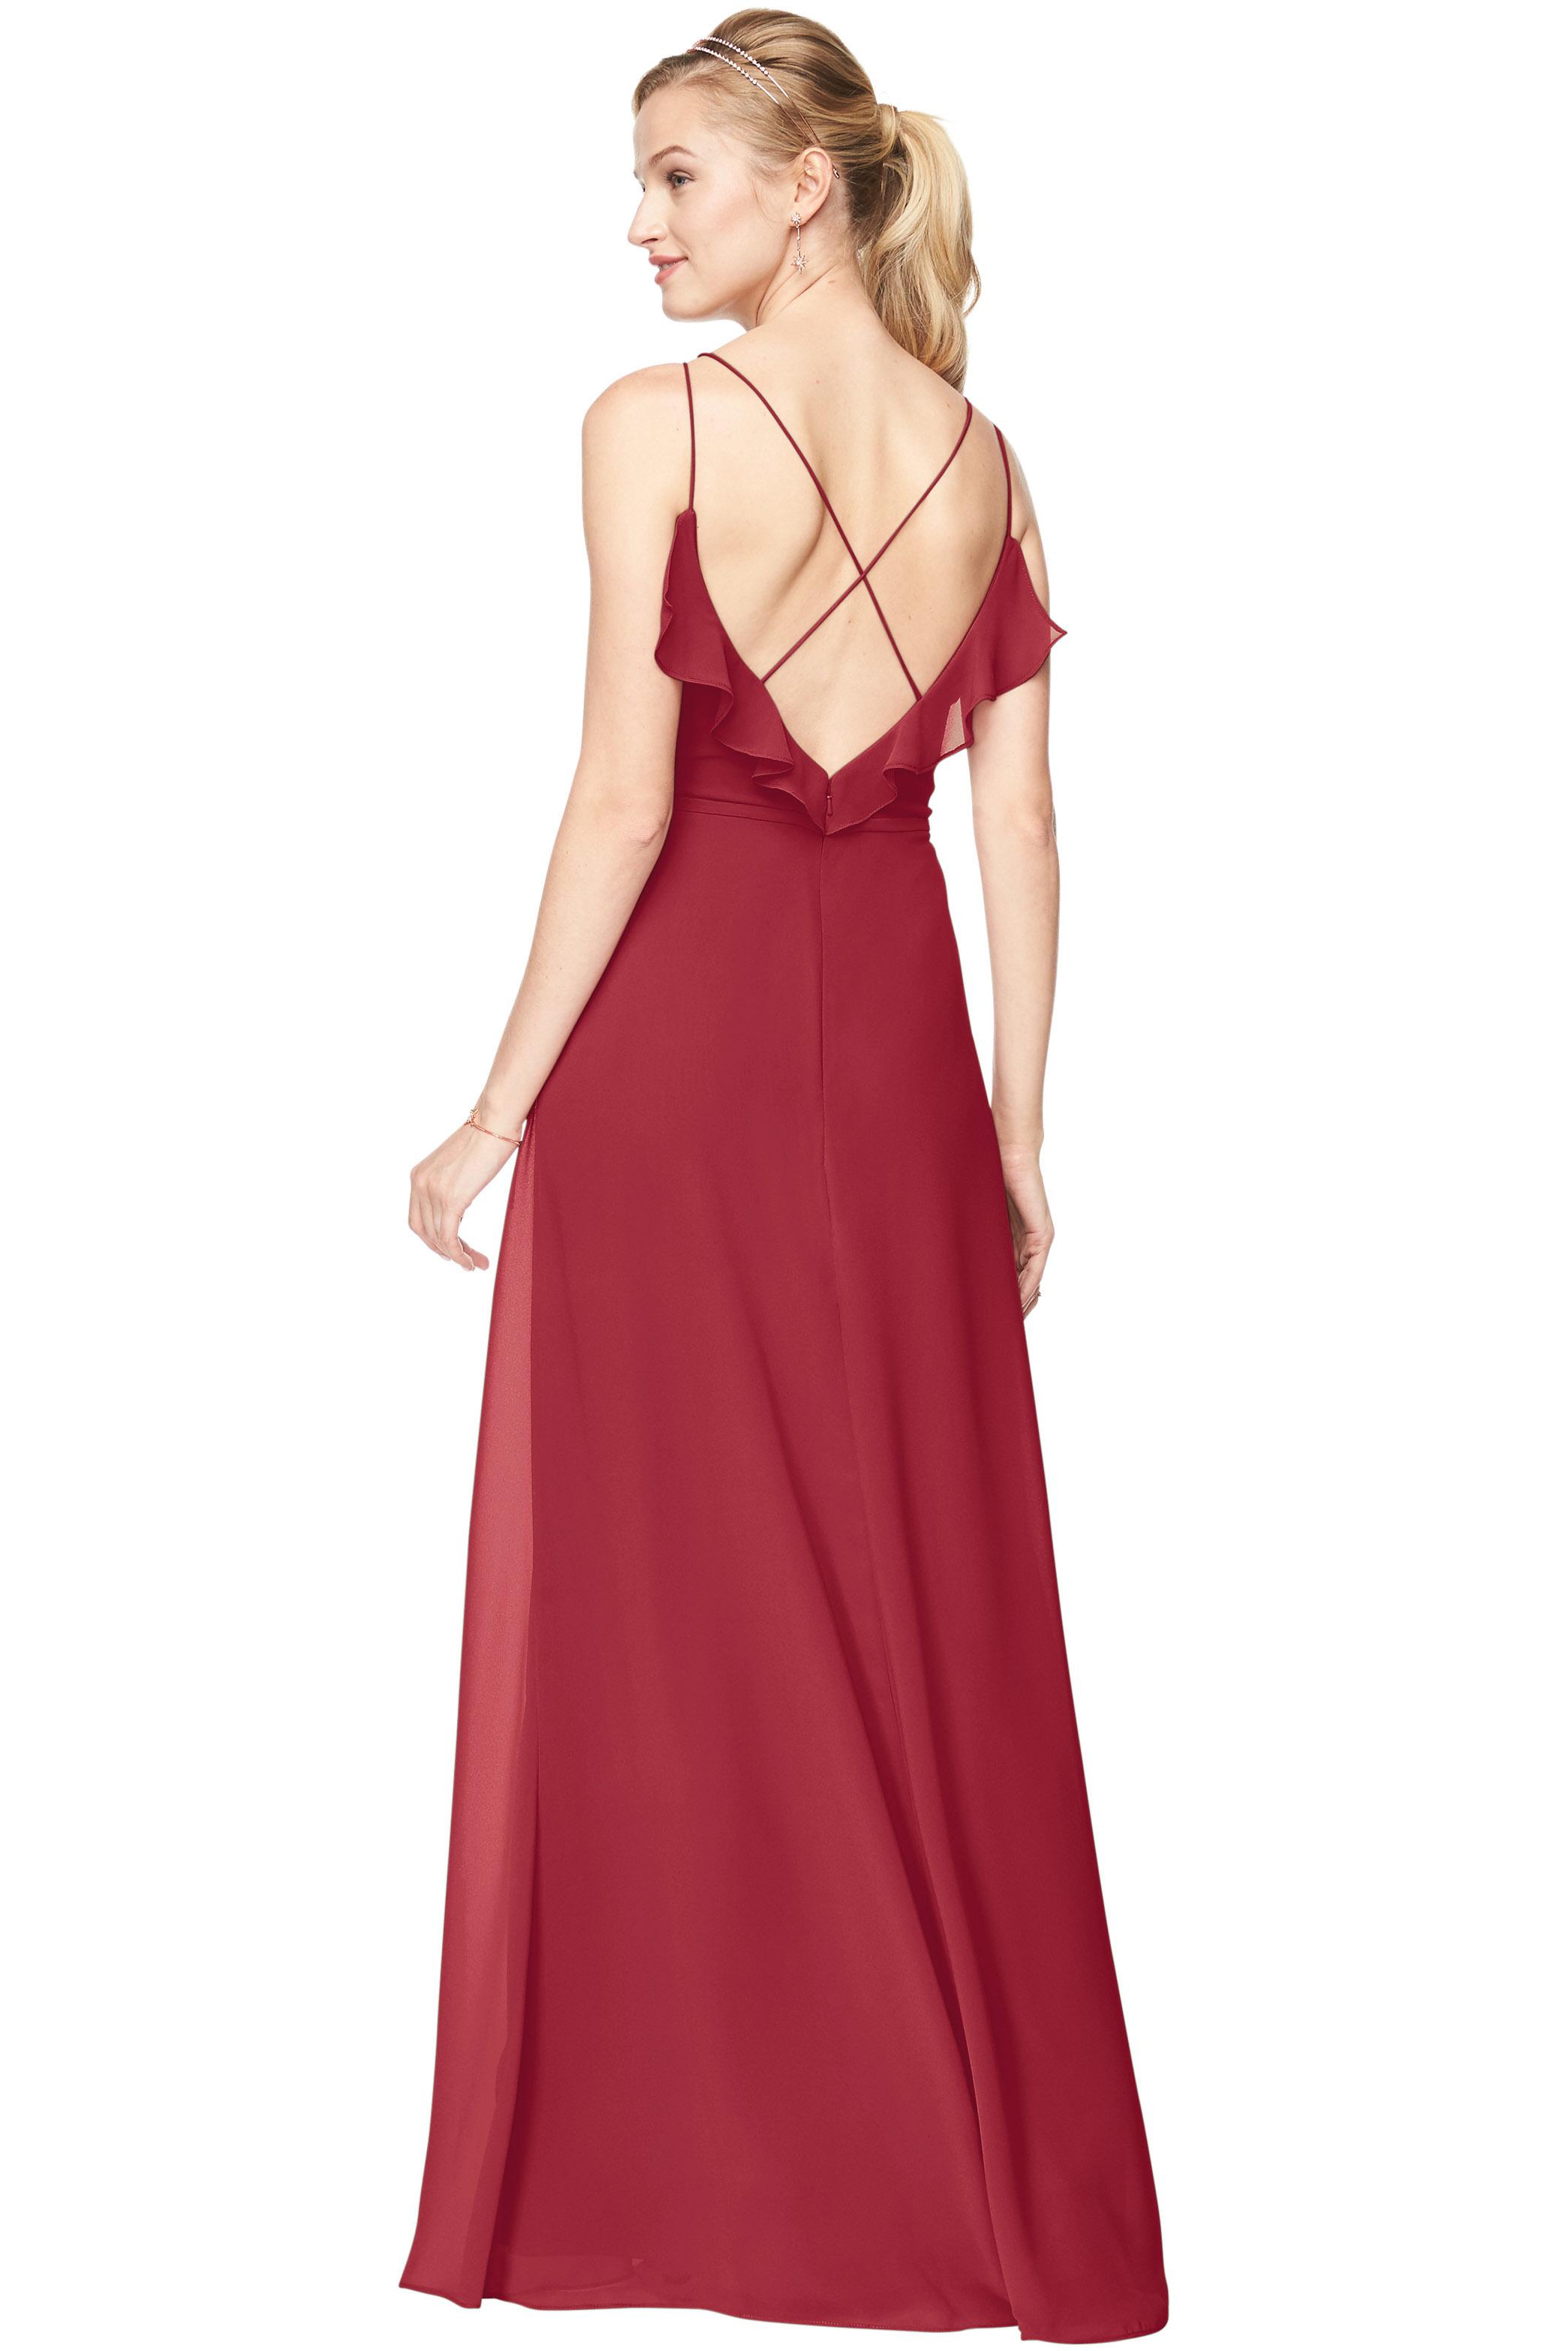 Bill Levkoff CHERRY Chiffon V-Neck A-line gown, $168.30 Back